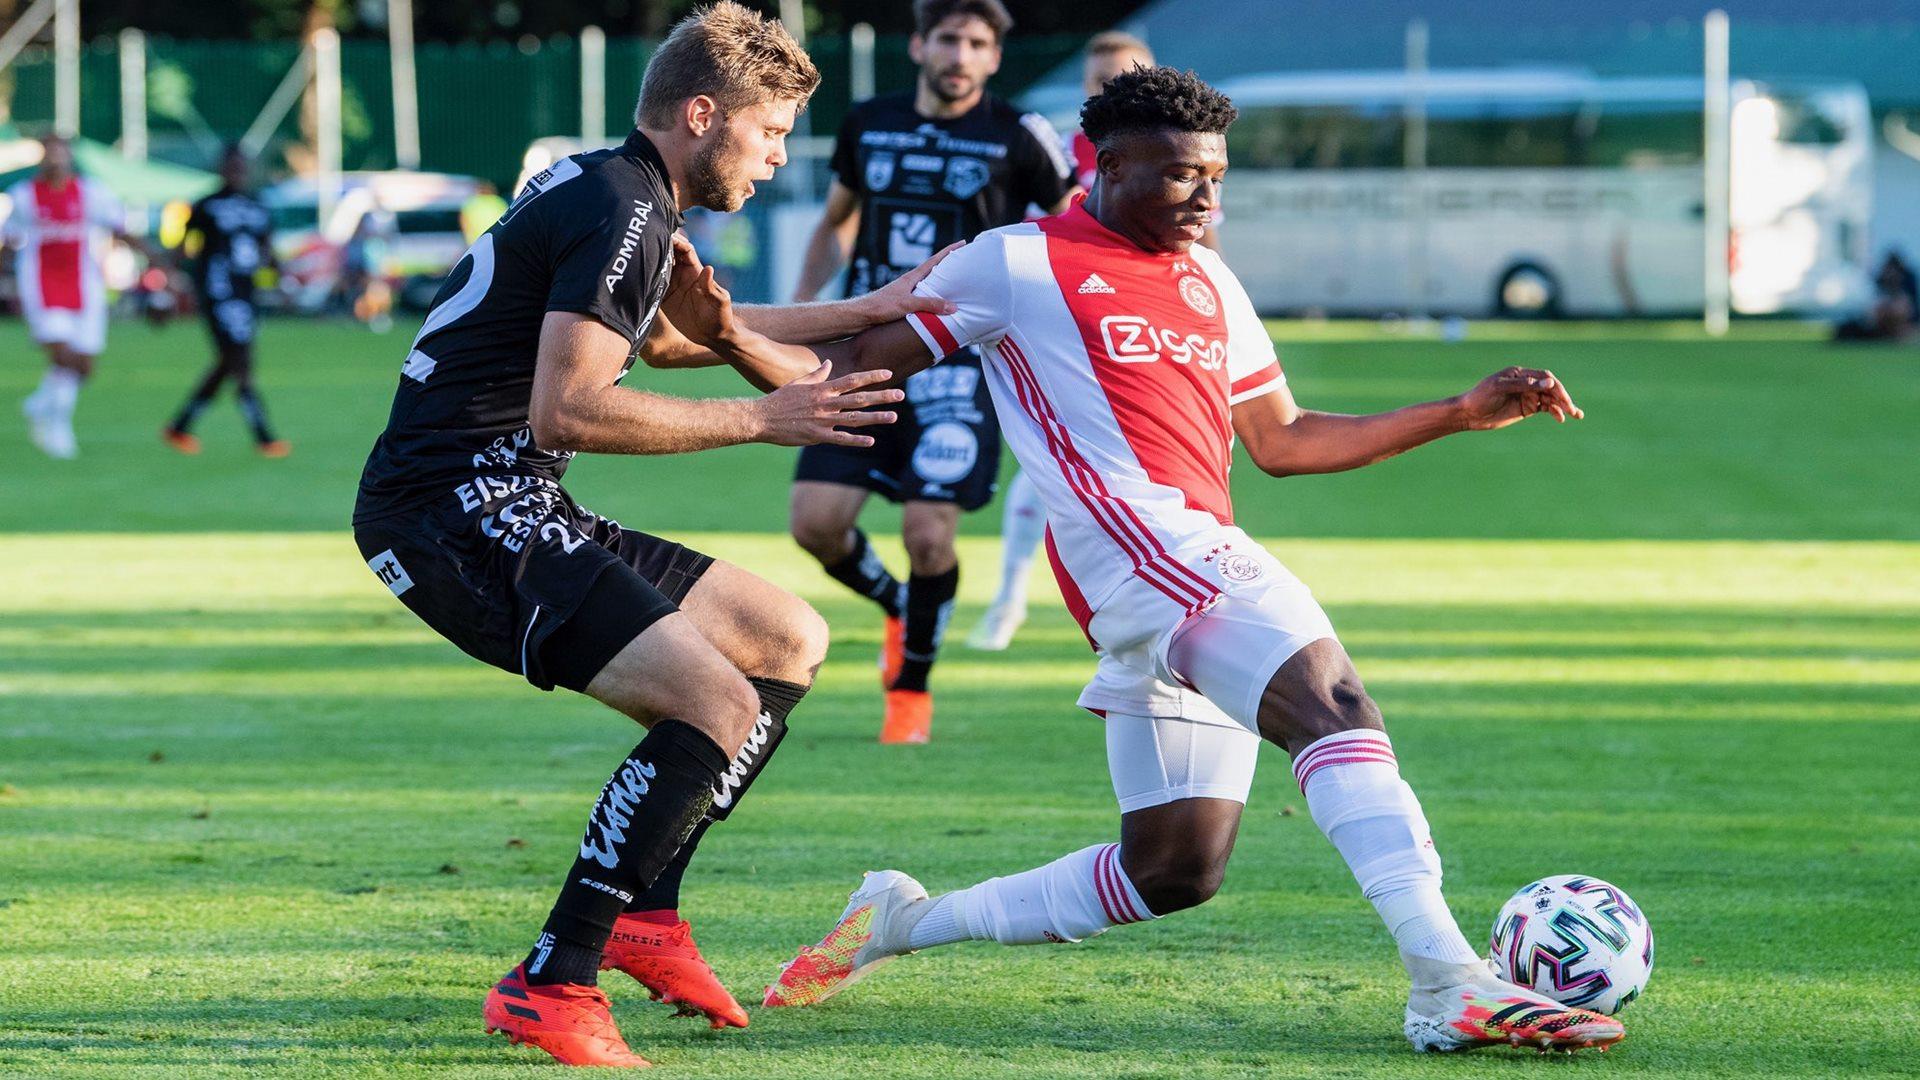 Ghana midfielder Kudus named Ajax's Man of the Match after impressive Eredivisie debut